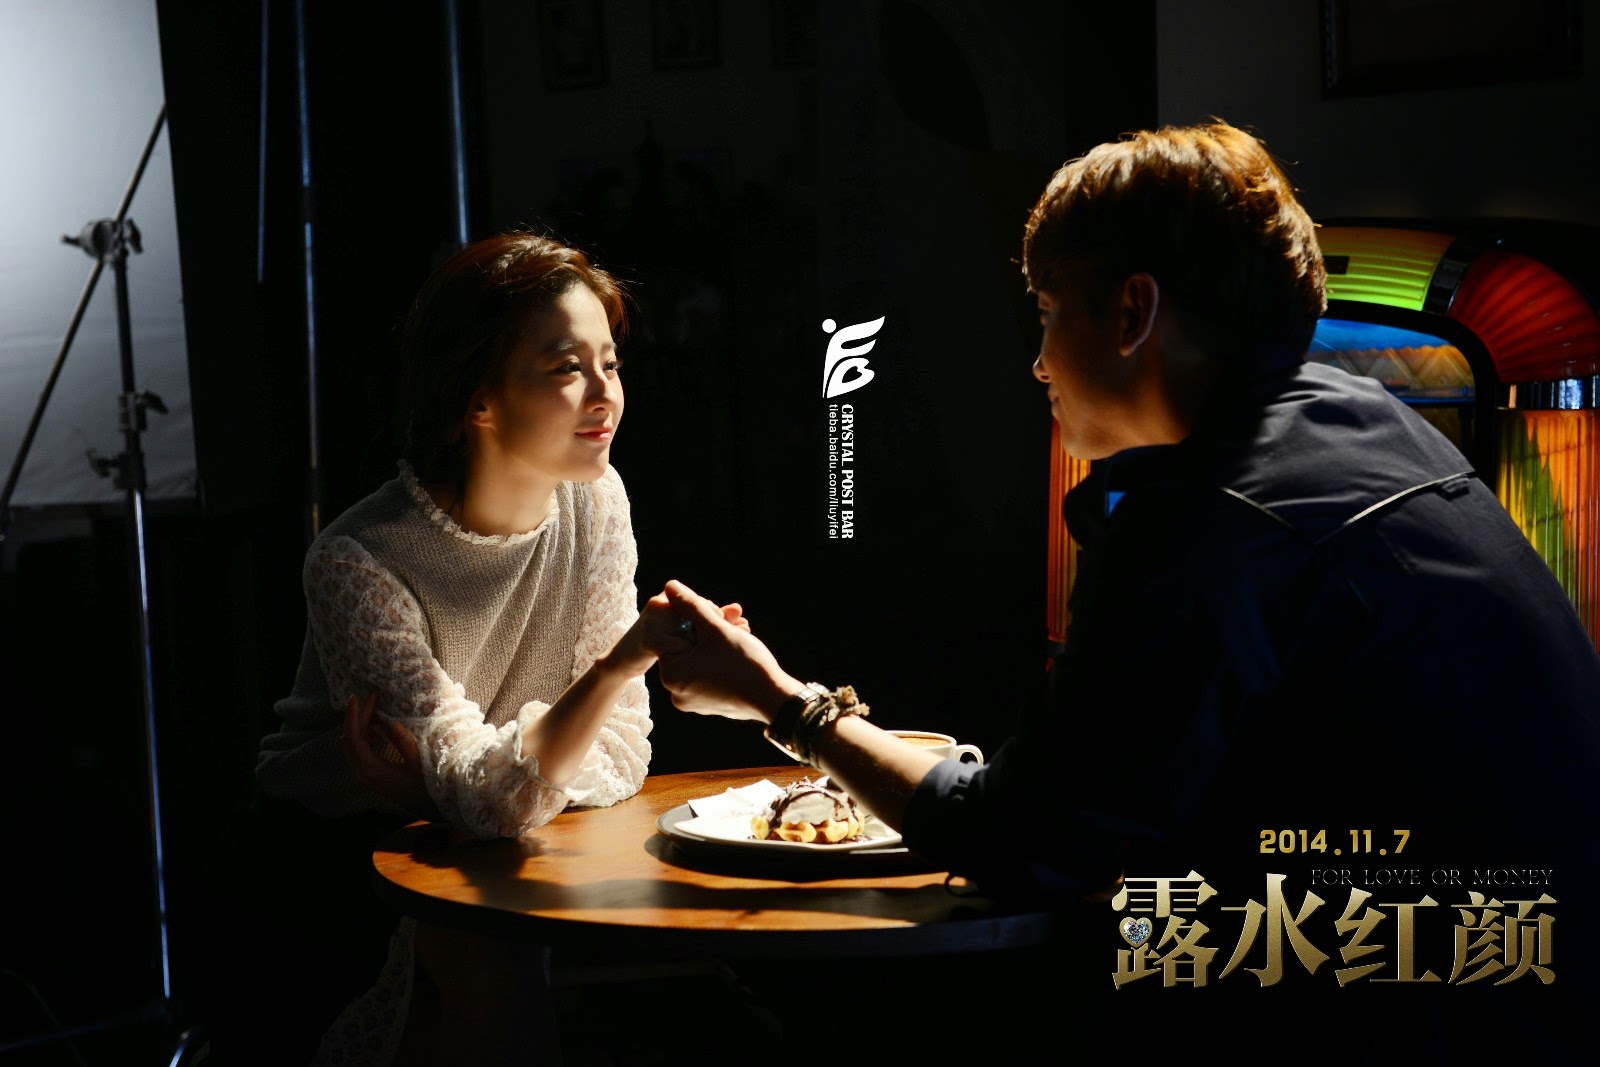 Rain 中国映画 露水紅顔_c0047605_8101081.jpg